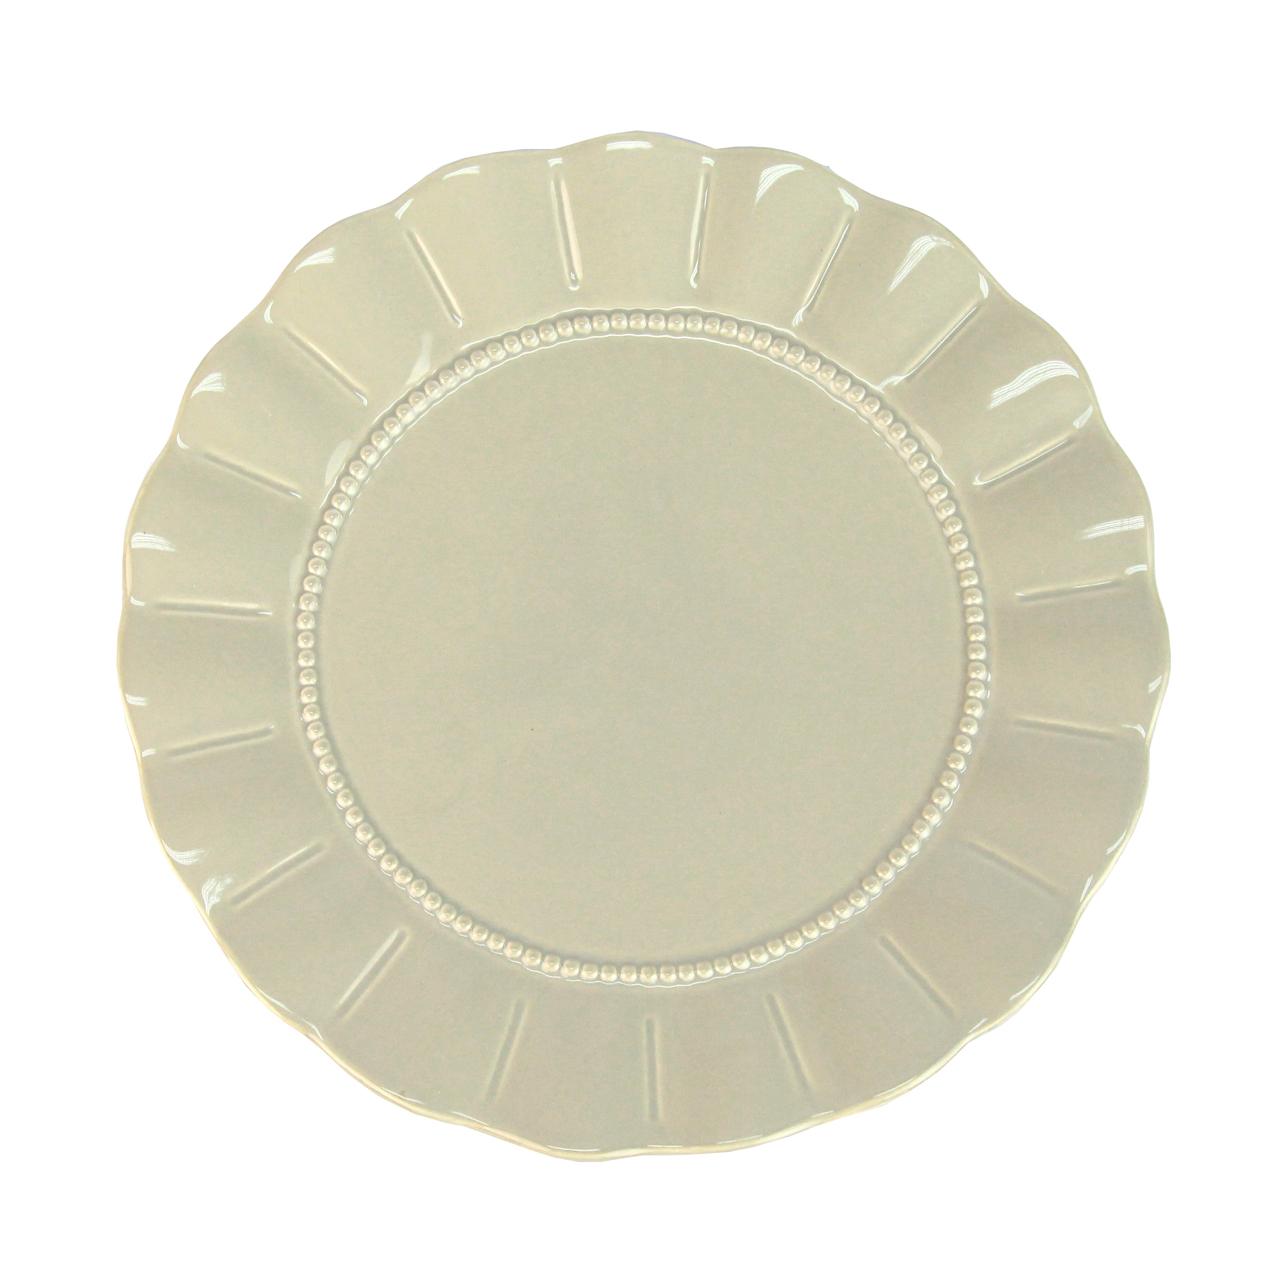 Farfurie Intinsa Din Ceramica Gri 25 Cm